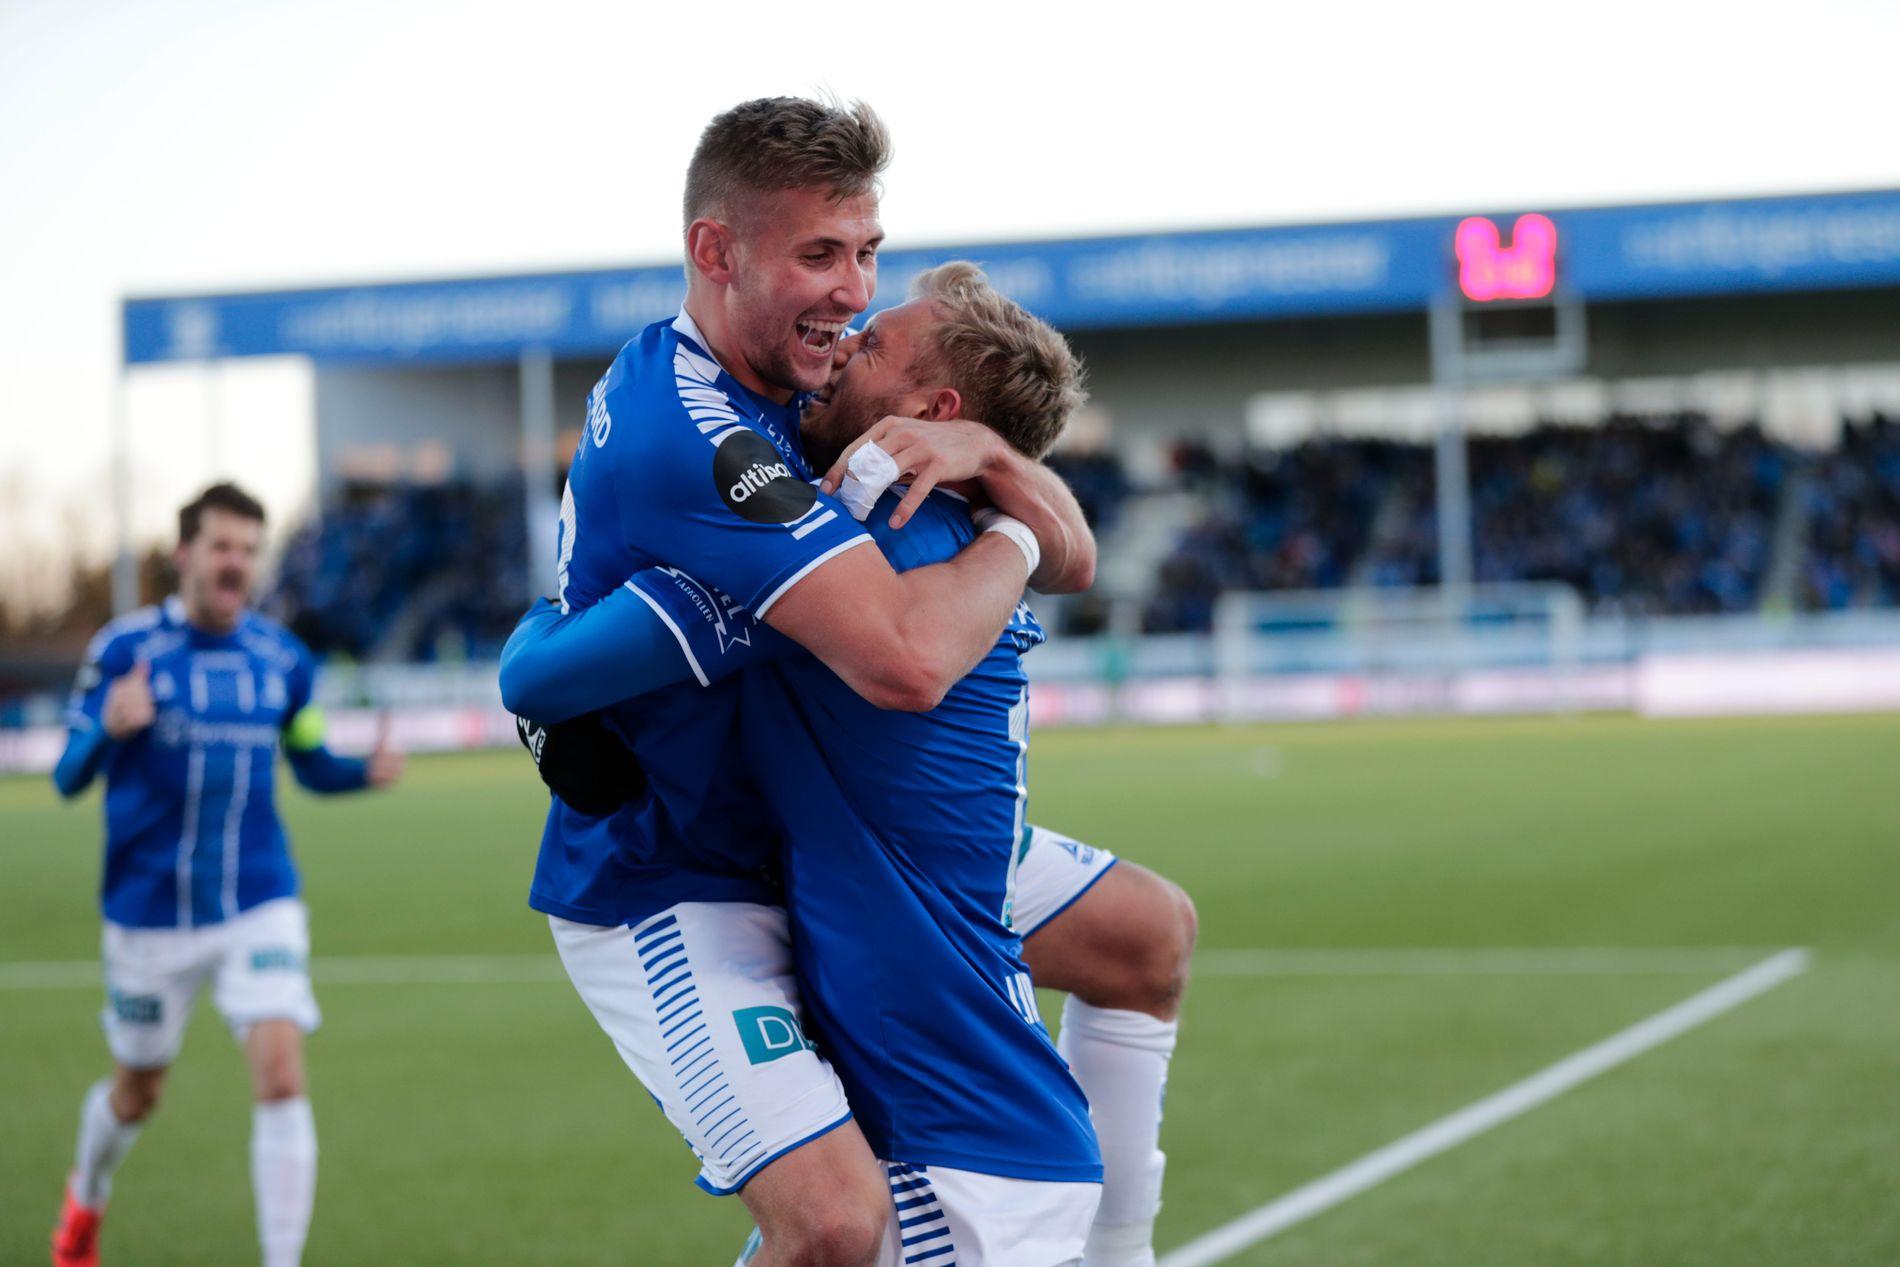 ENDELIG: Steffen Lie Skålevik feirer med målscorer Jonathan Lindseth.